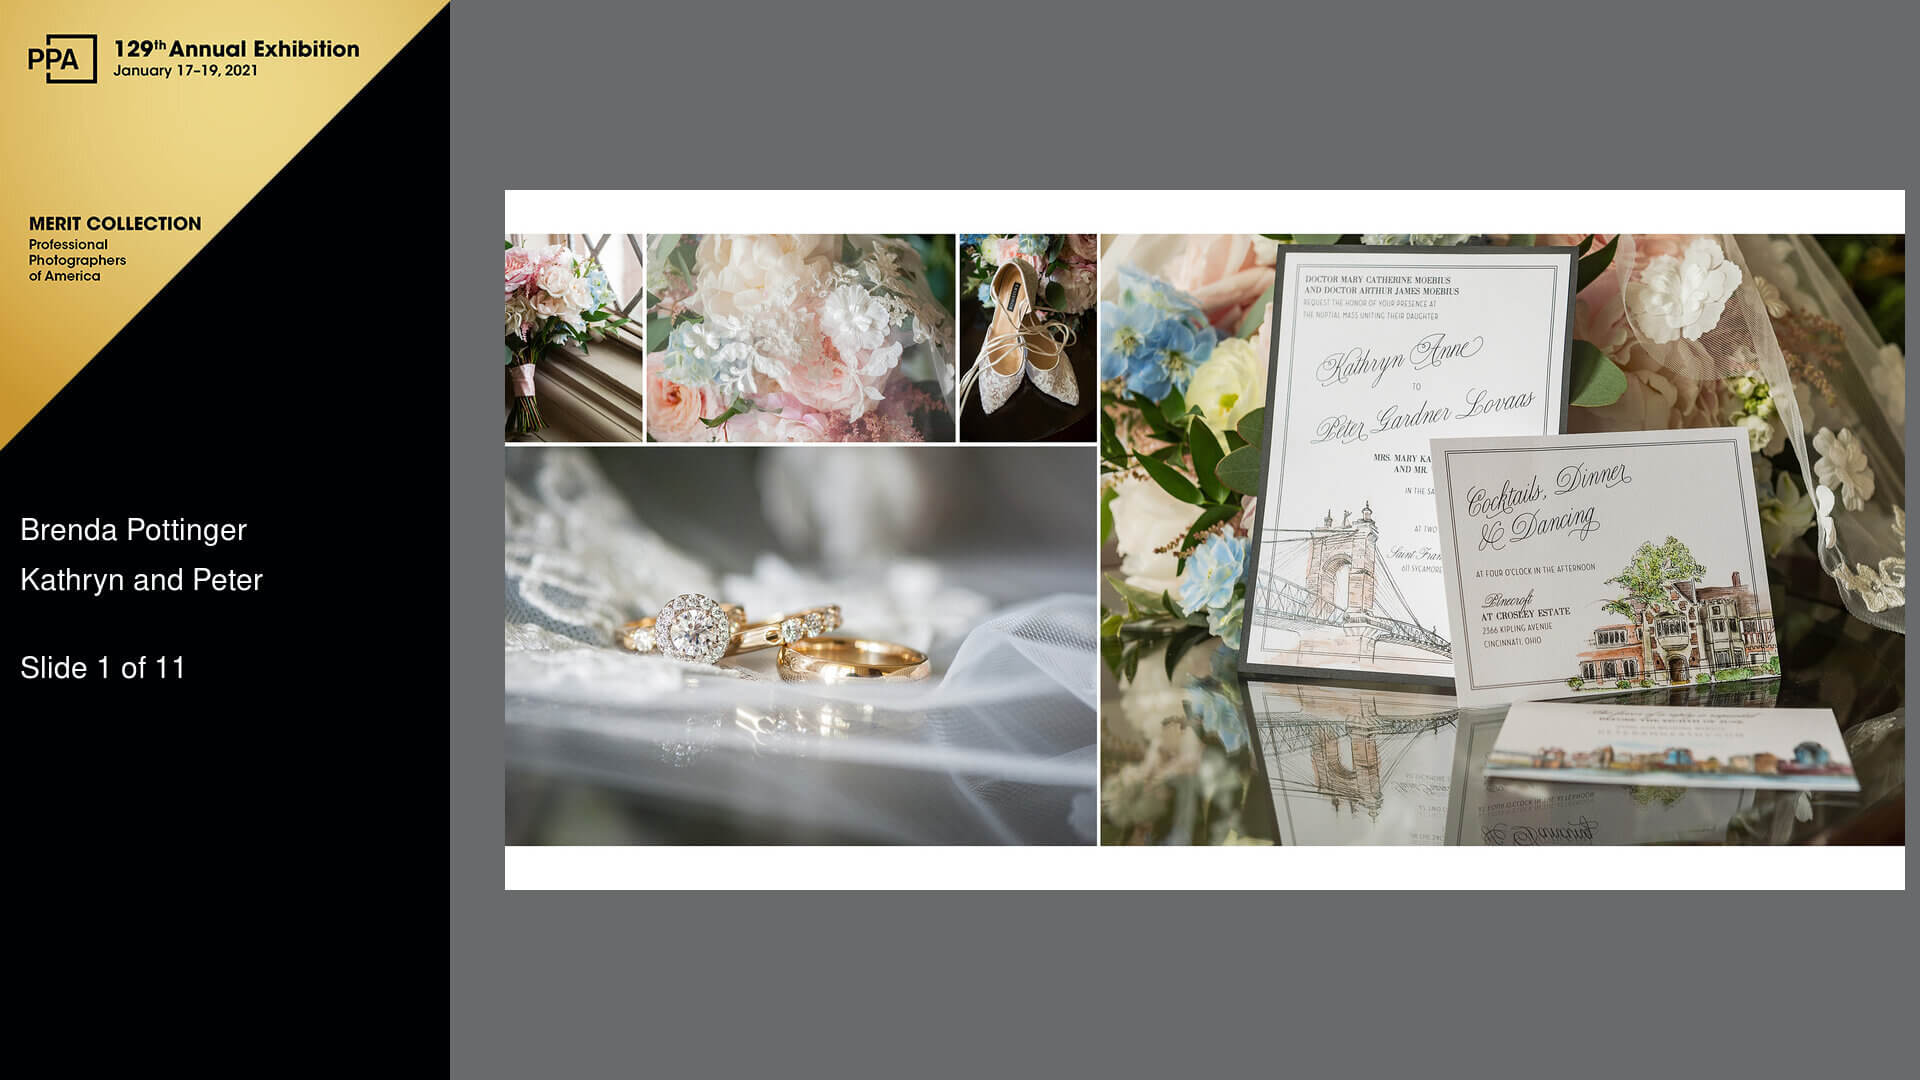 Pinecroft at Crosley Estate wedding photo